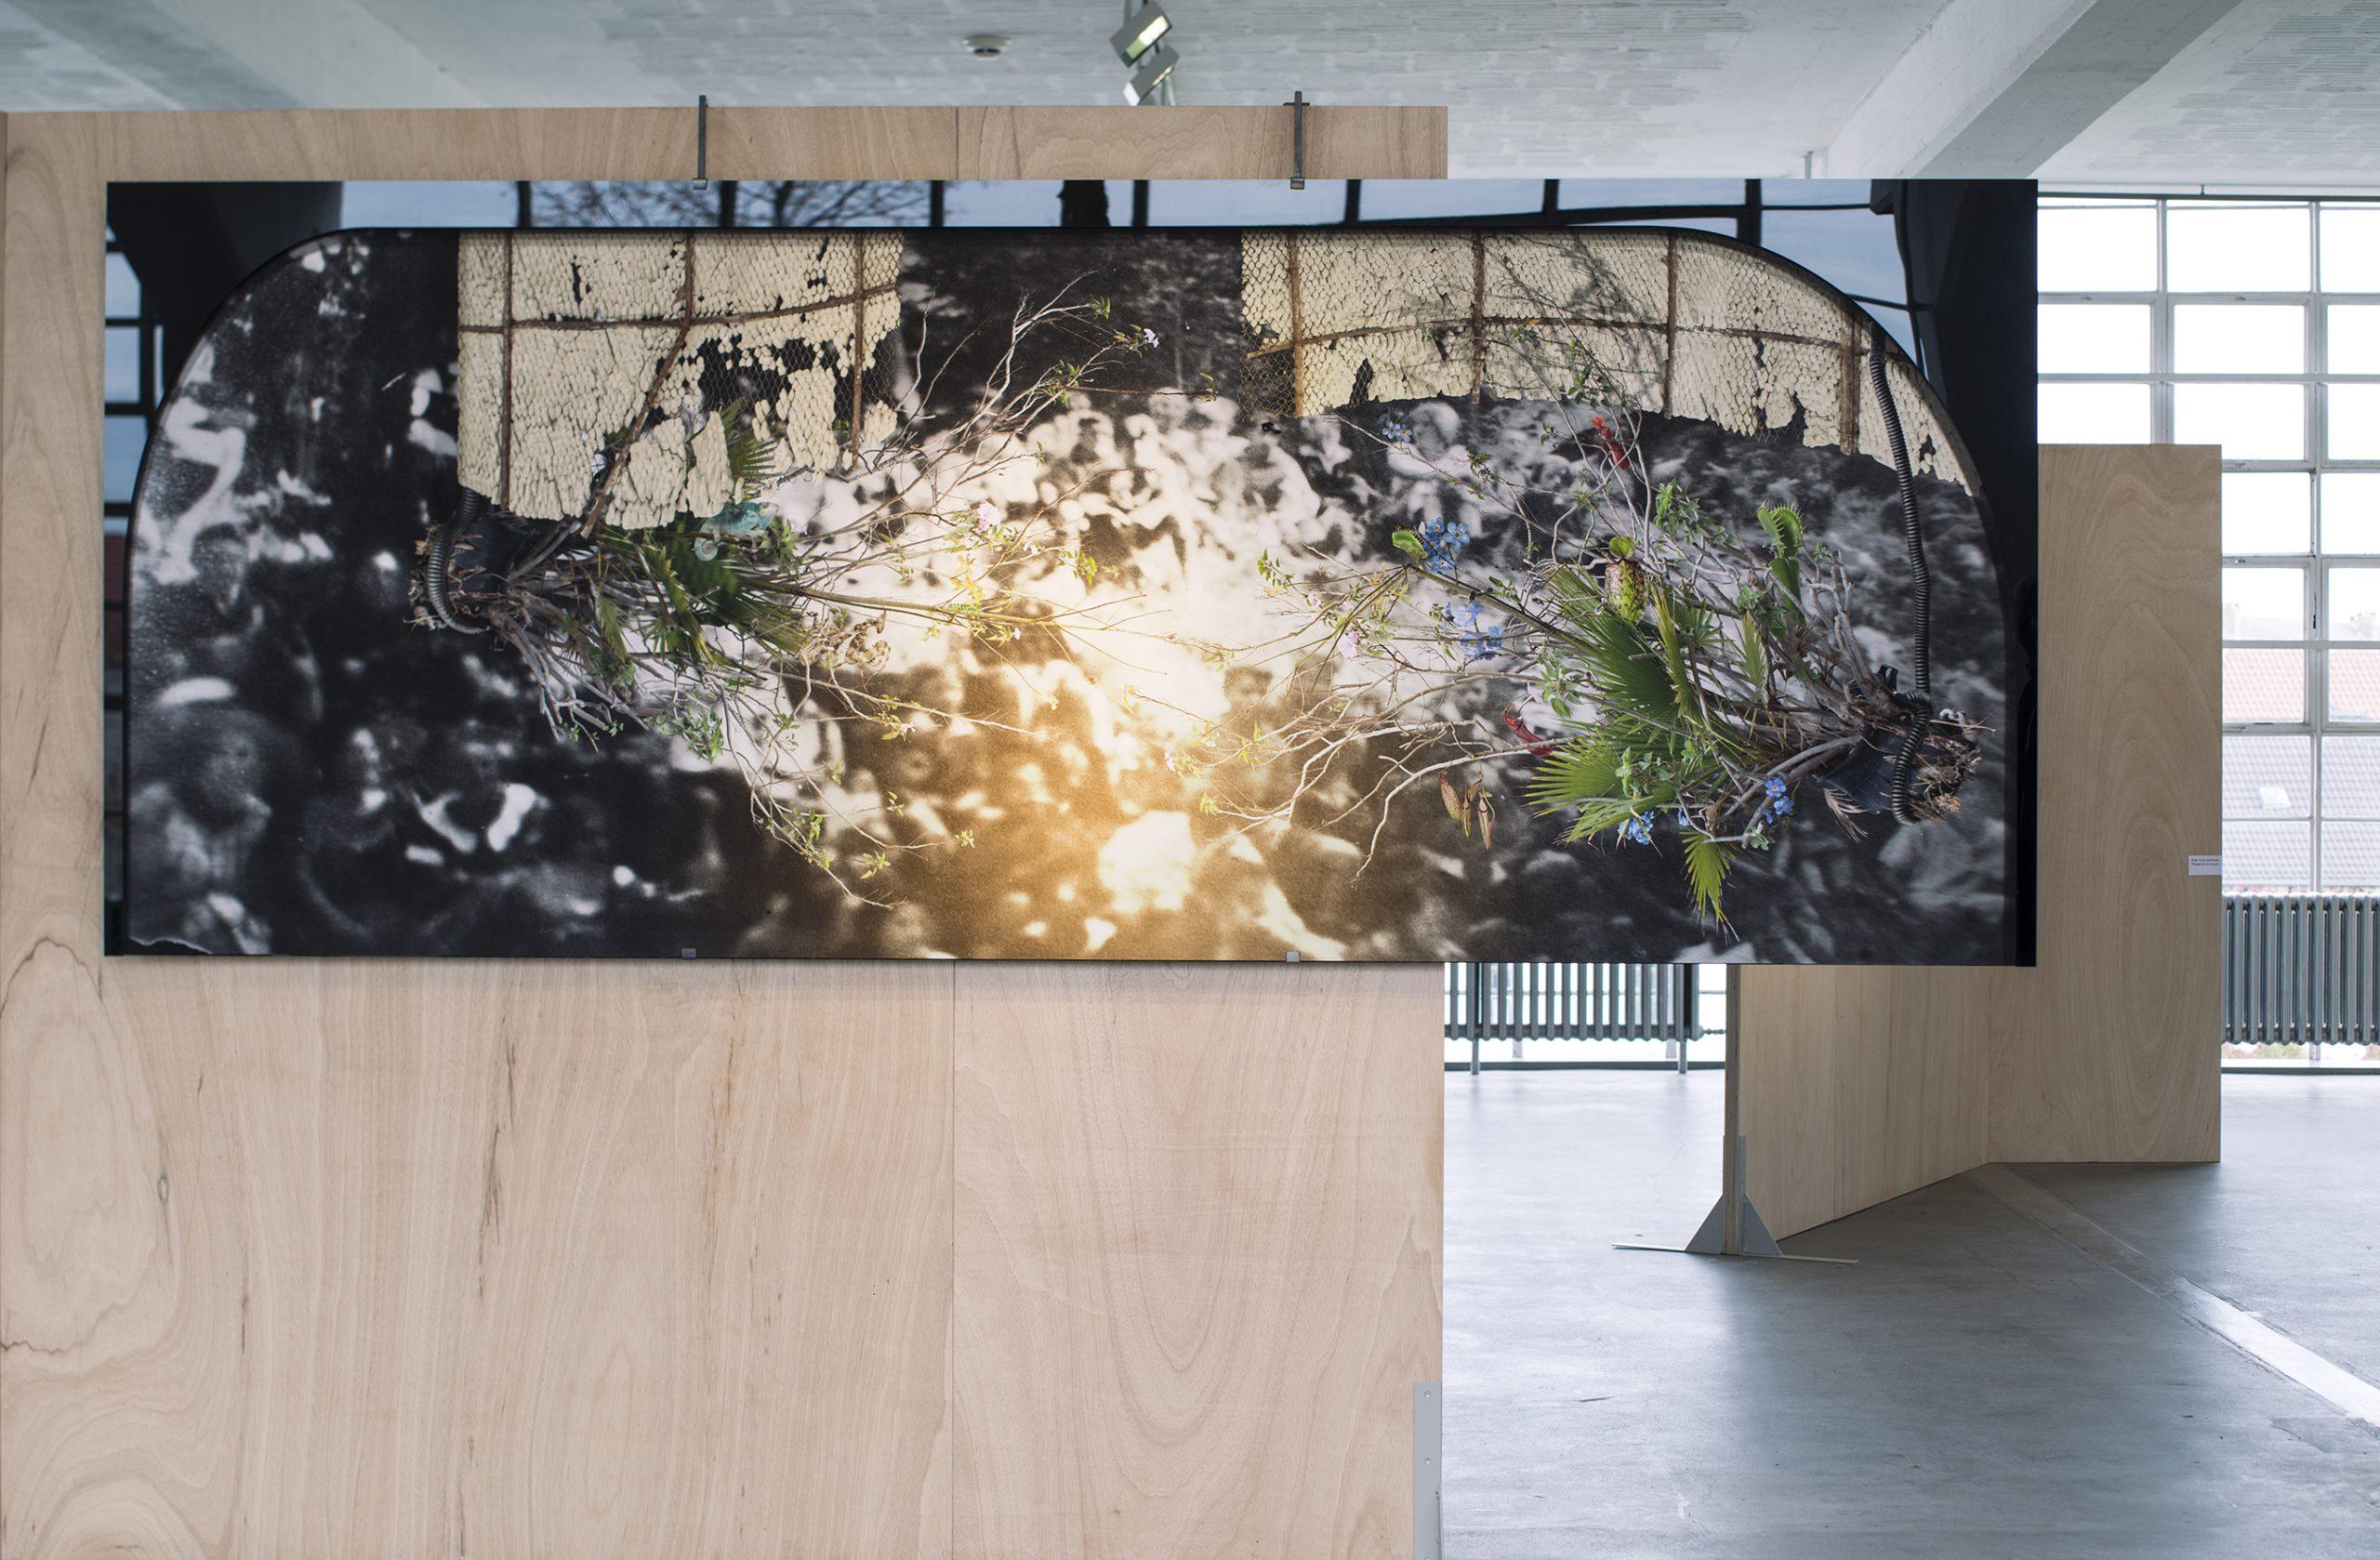 Ilit Azoulay, Transfer Agreement (White City Black City), installation view, Bauhaus Dessau 2019